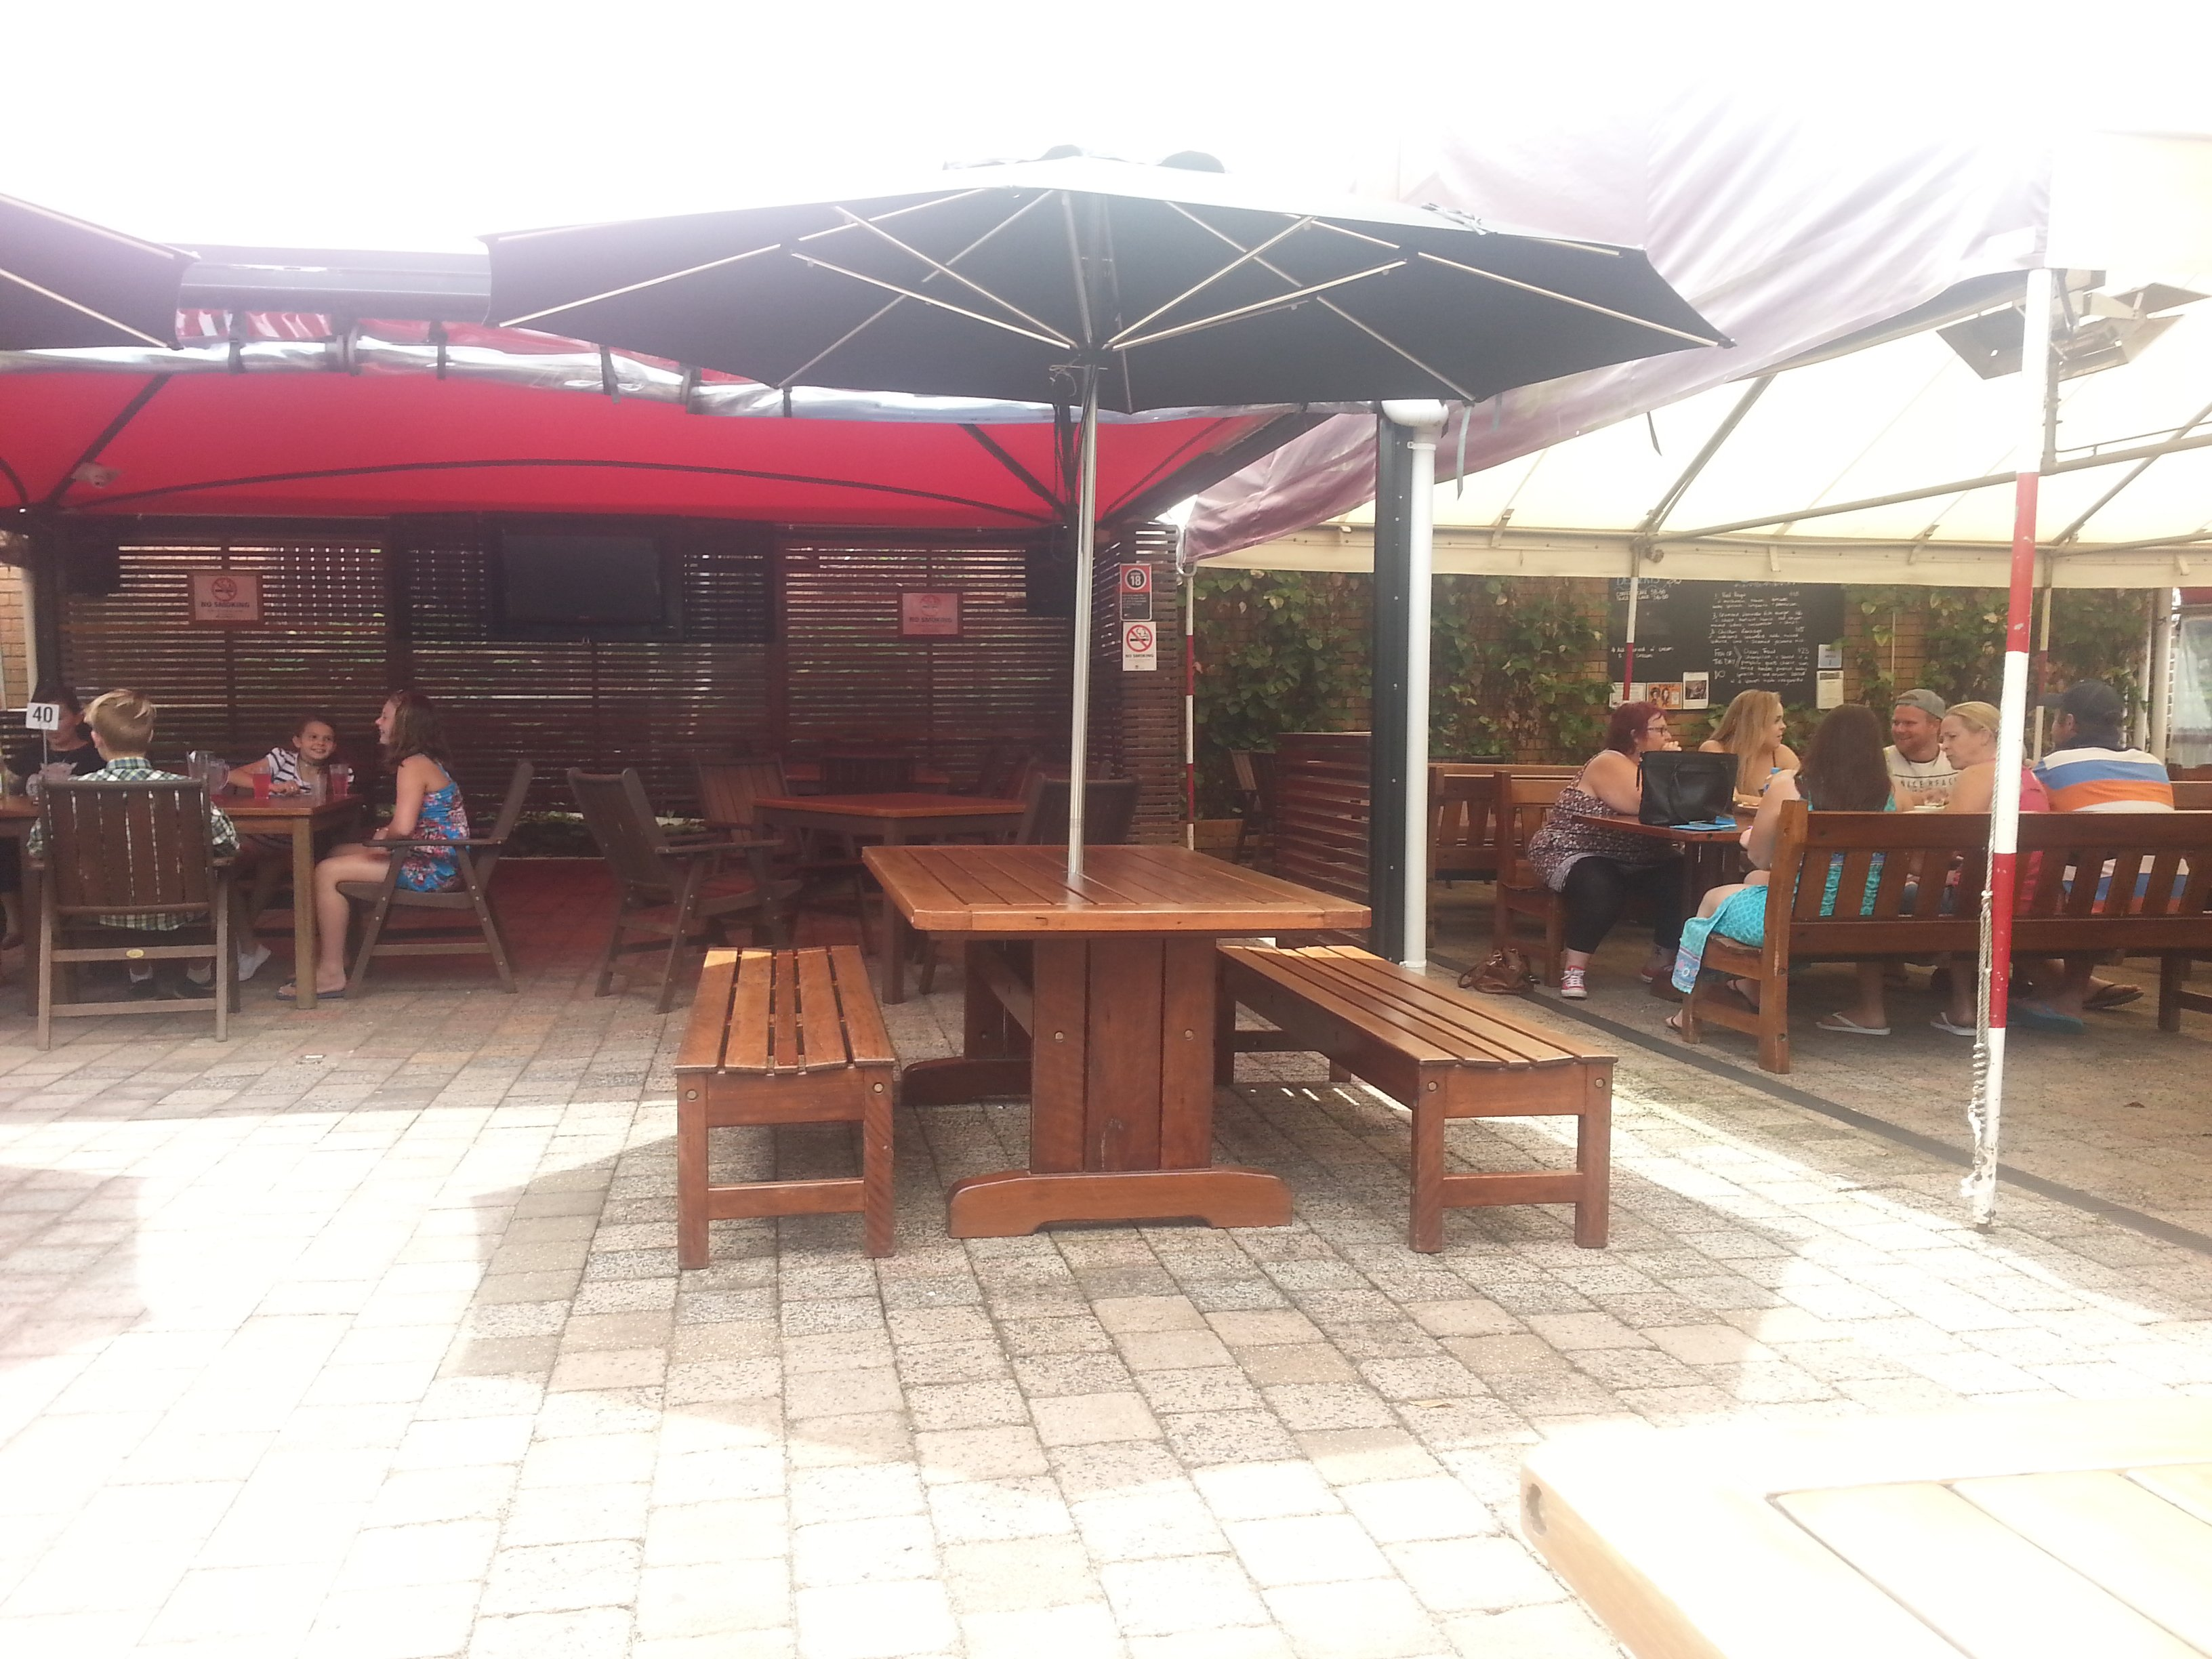 Top 10 Australian food in Alstonville, New South Wales, Australia